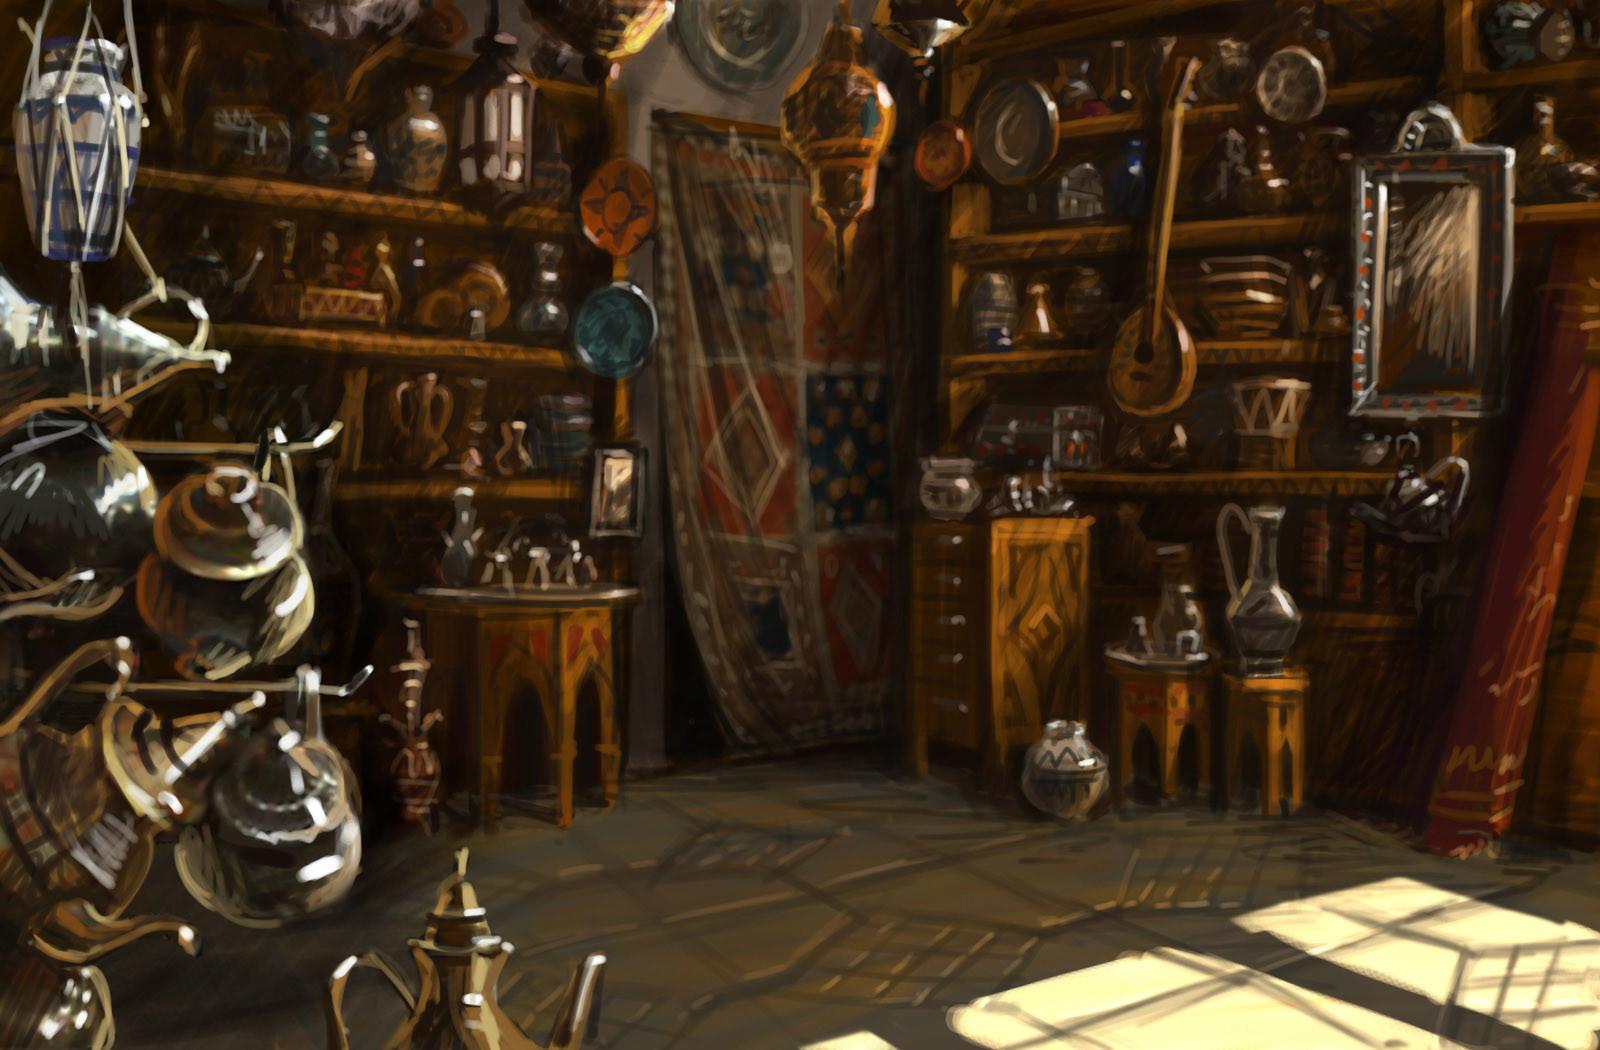 olga antonenko marrakesh antique shop backgrounds for lost horizon game. Black Bedroom Furniture Sets. Home Design Ideas